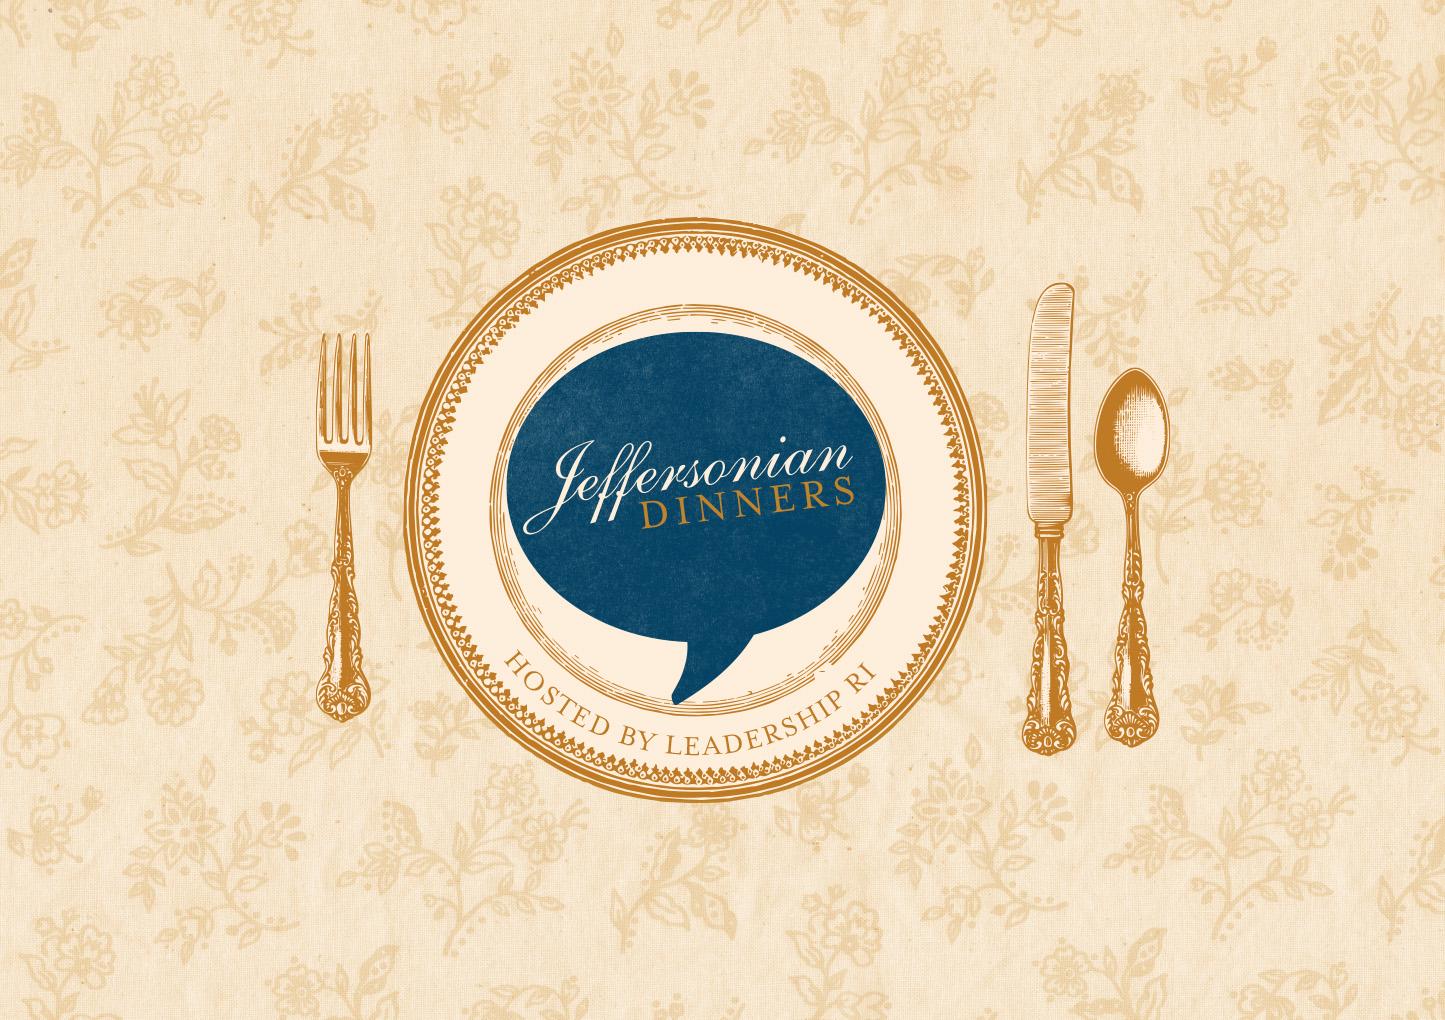 alli-coate-jeffersonian-dinner-logo.jpg